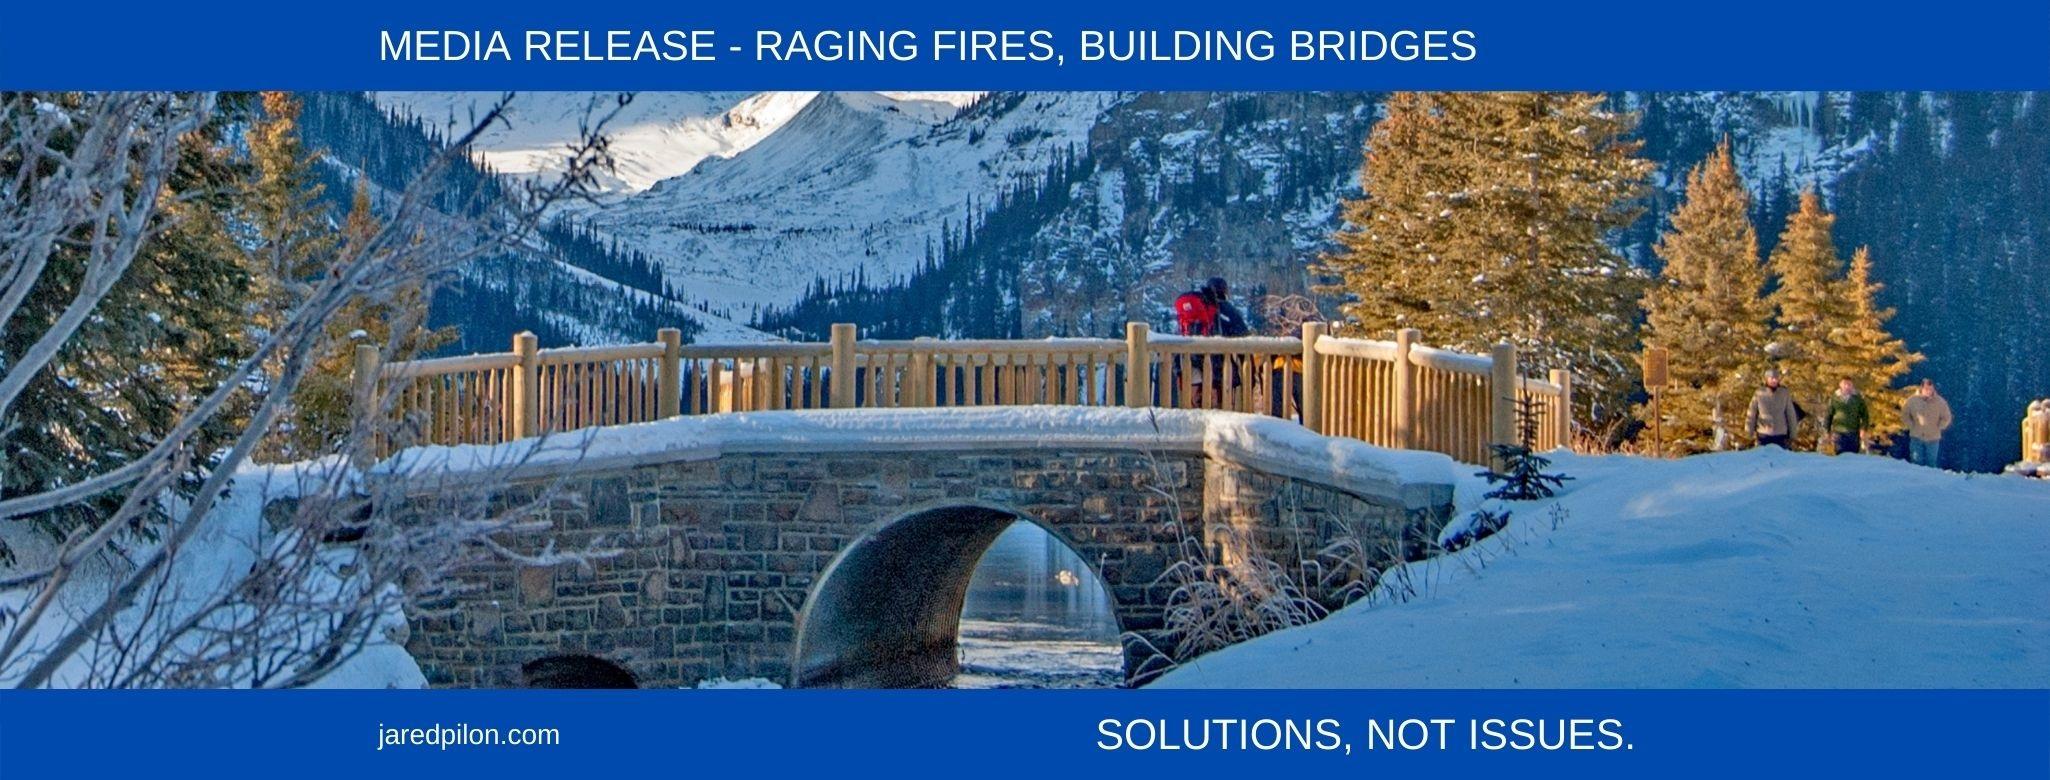 RAGING FIRES, BUILDING BRIDGES